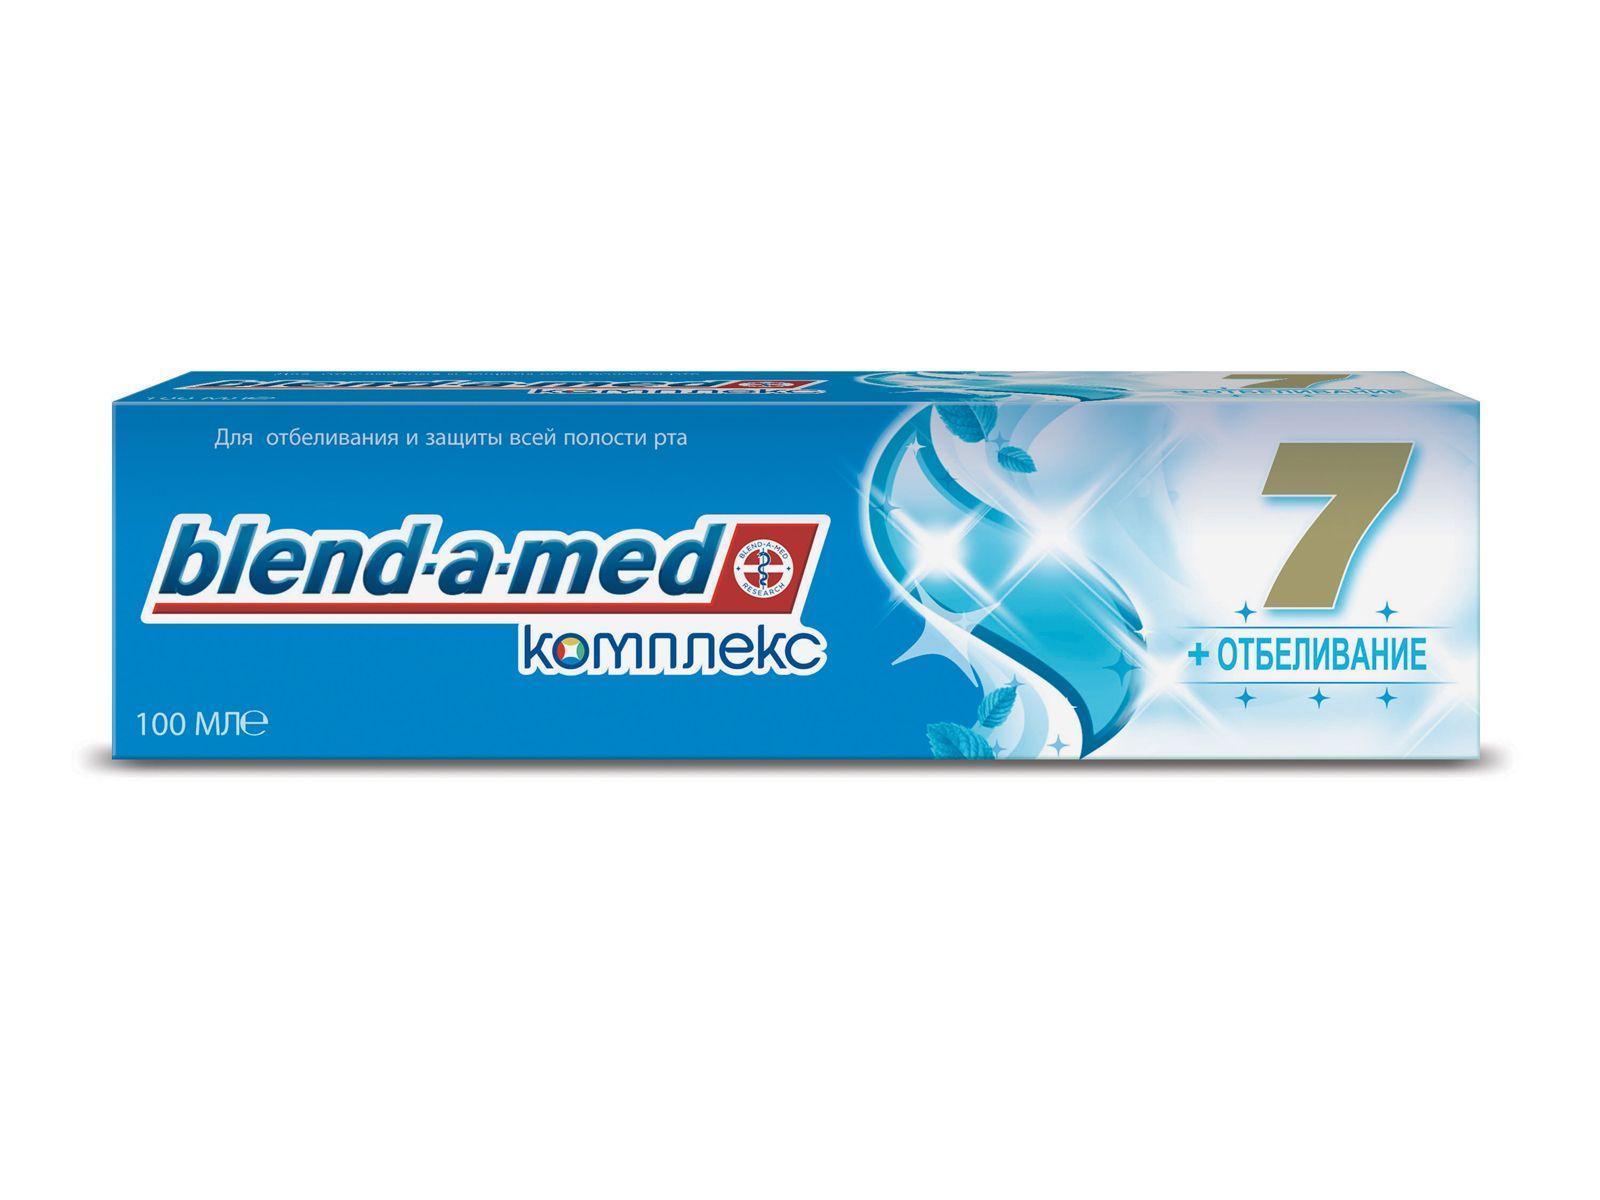 Зубная паста Blend-a-med Комплекс 7 + отбеливание